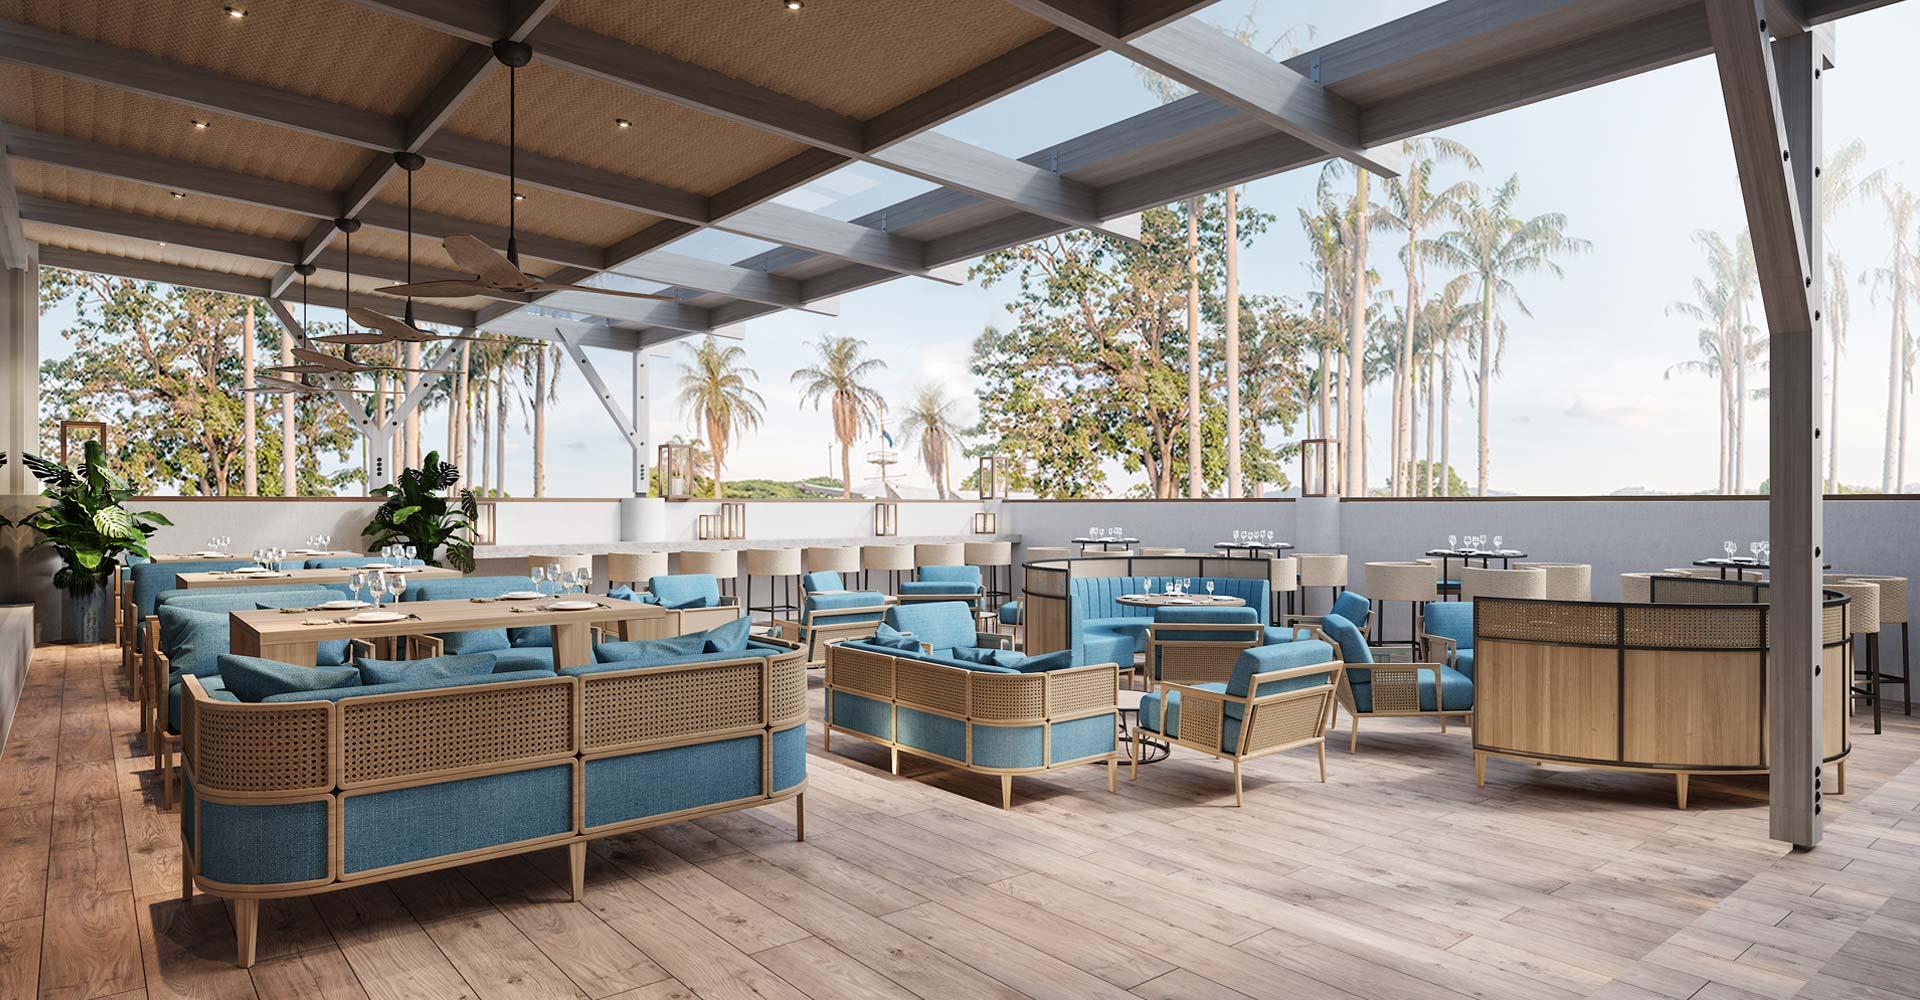 Blue and rattan open air restaurant Ibiza by Costa Blanca Interior Design Studio